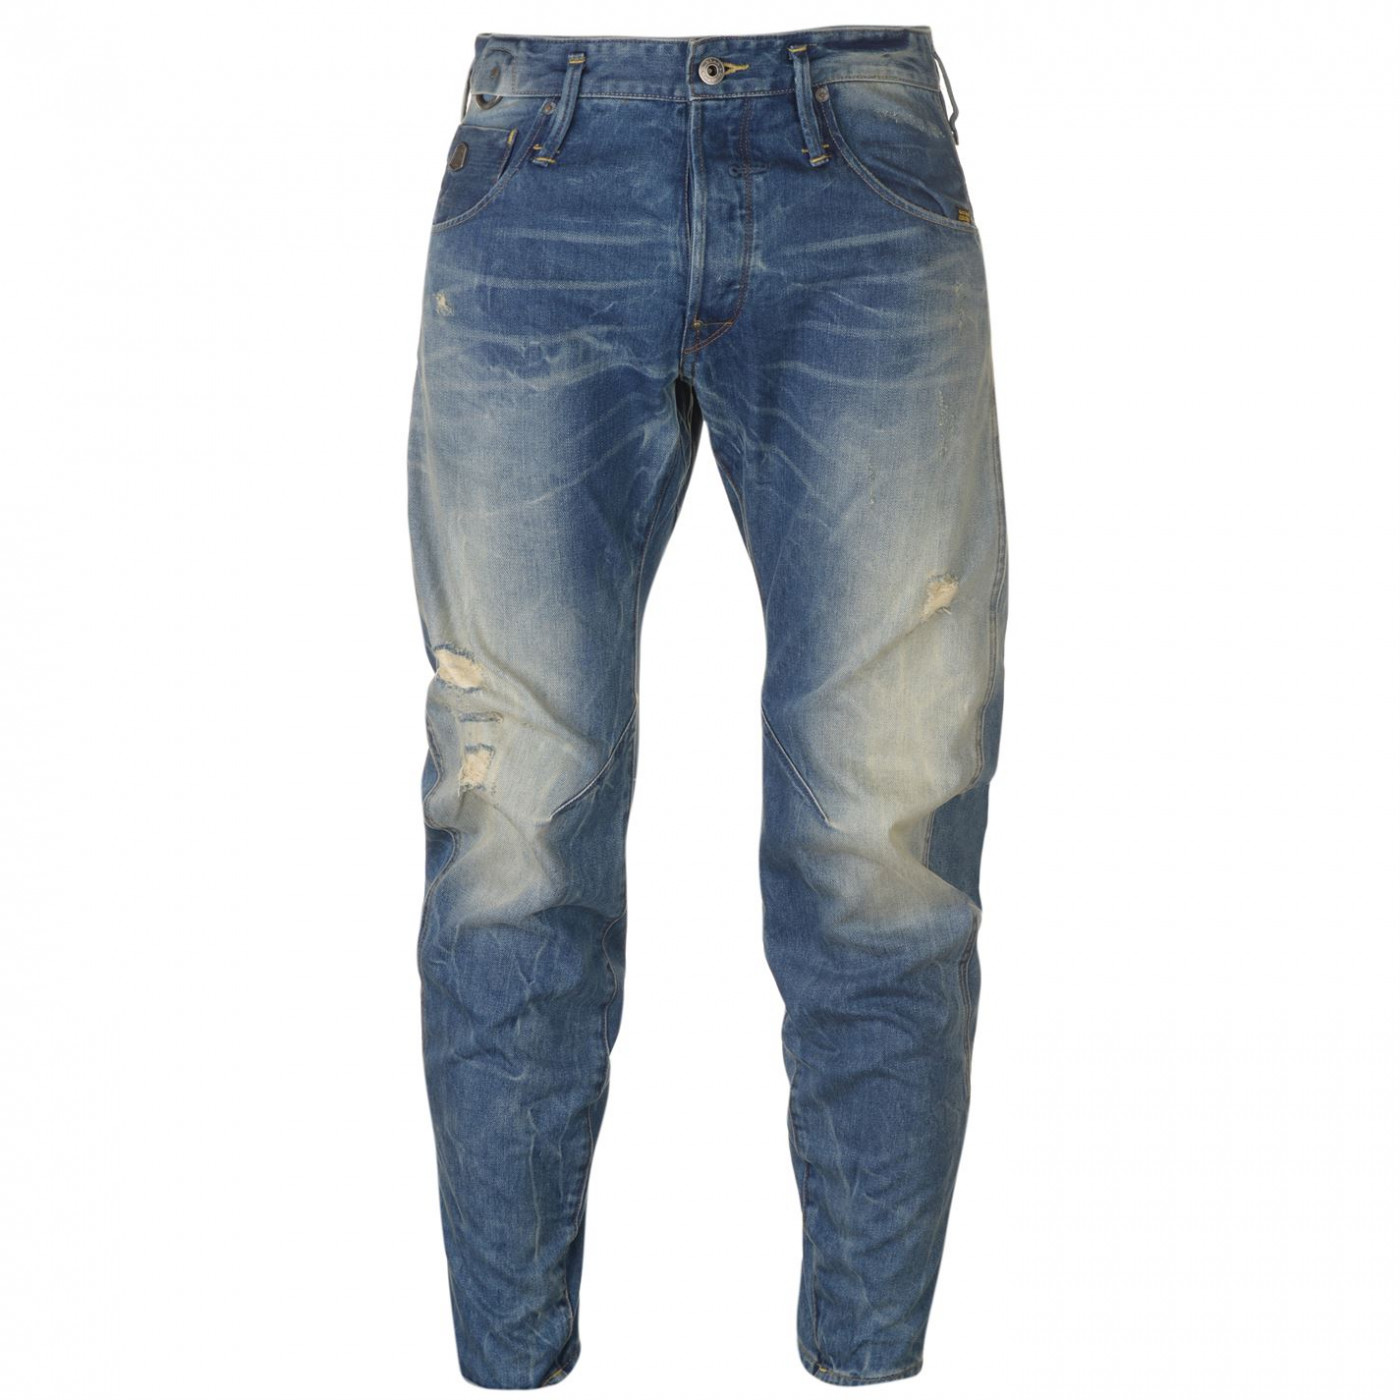 G Star 50746 Jeans